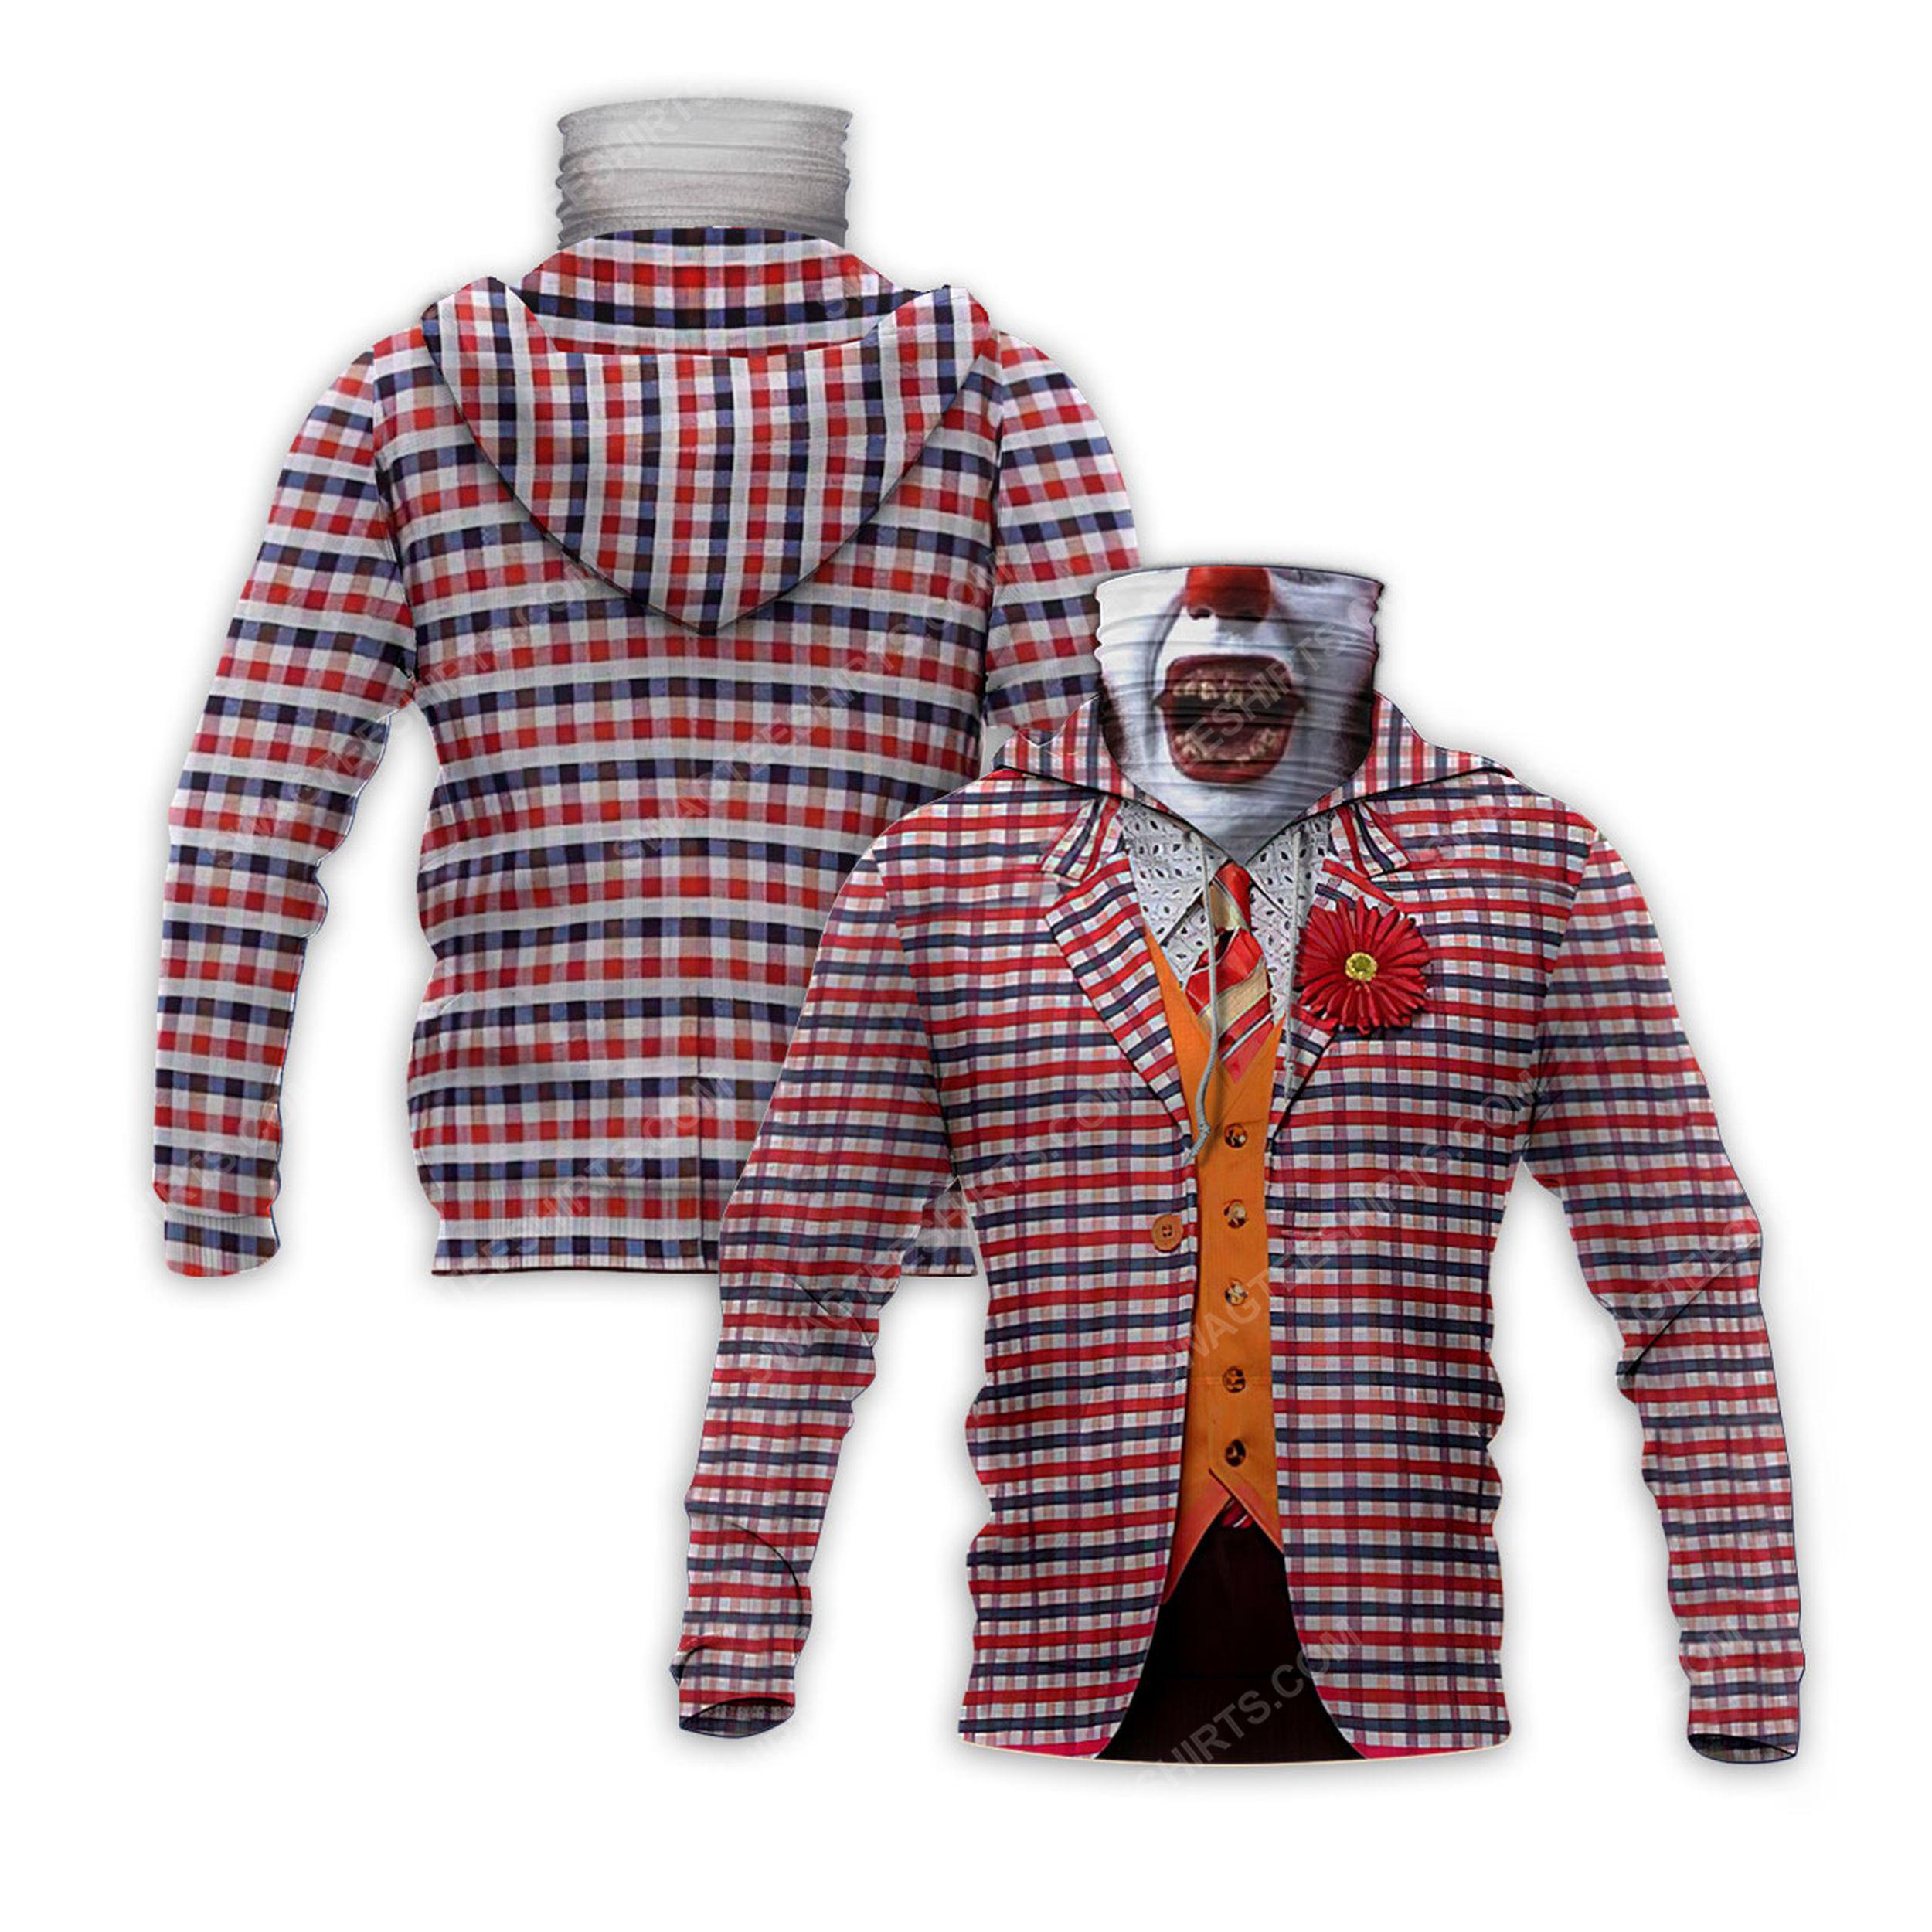 The movie joker for halloween full print mask hoodie 2(1) - Copy